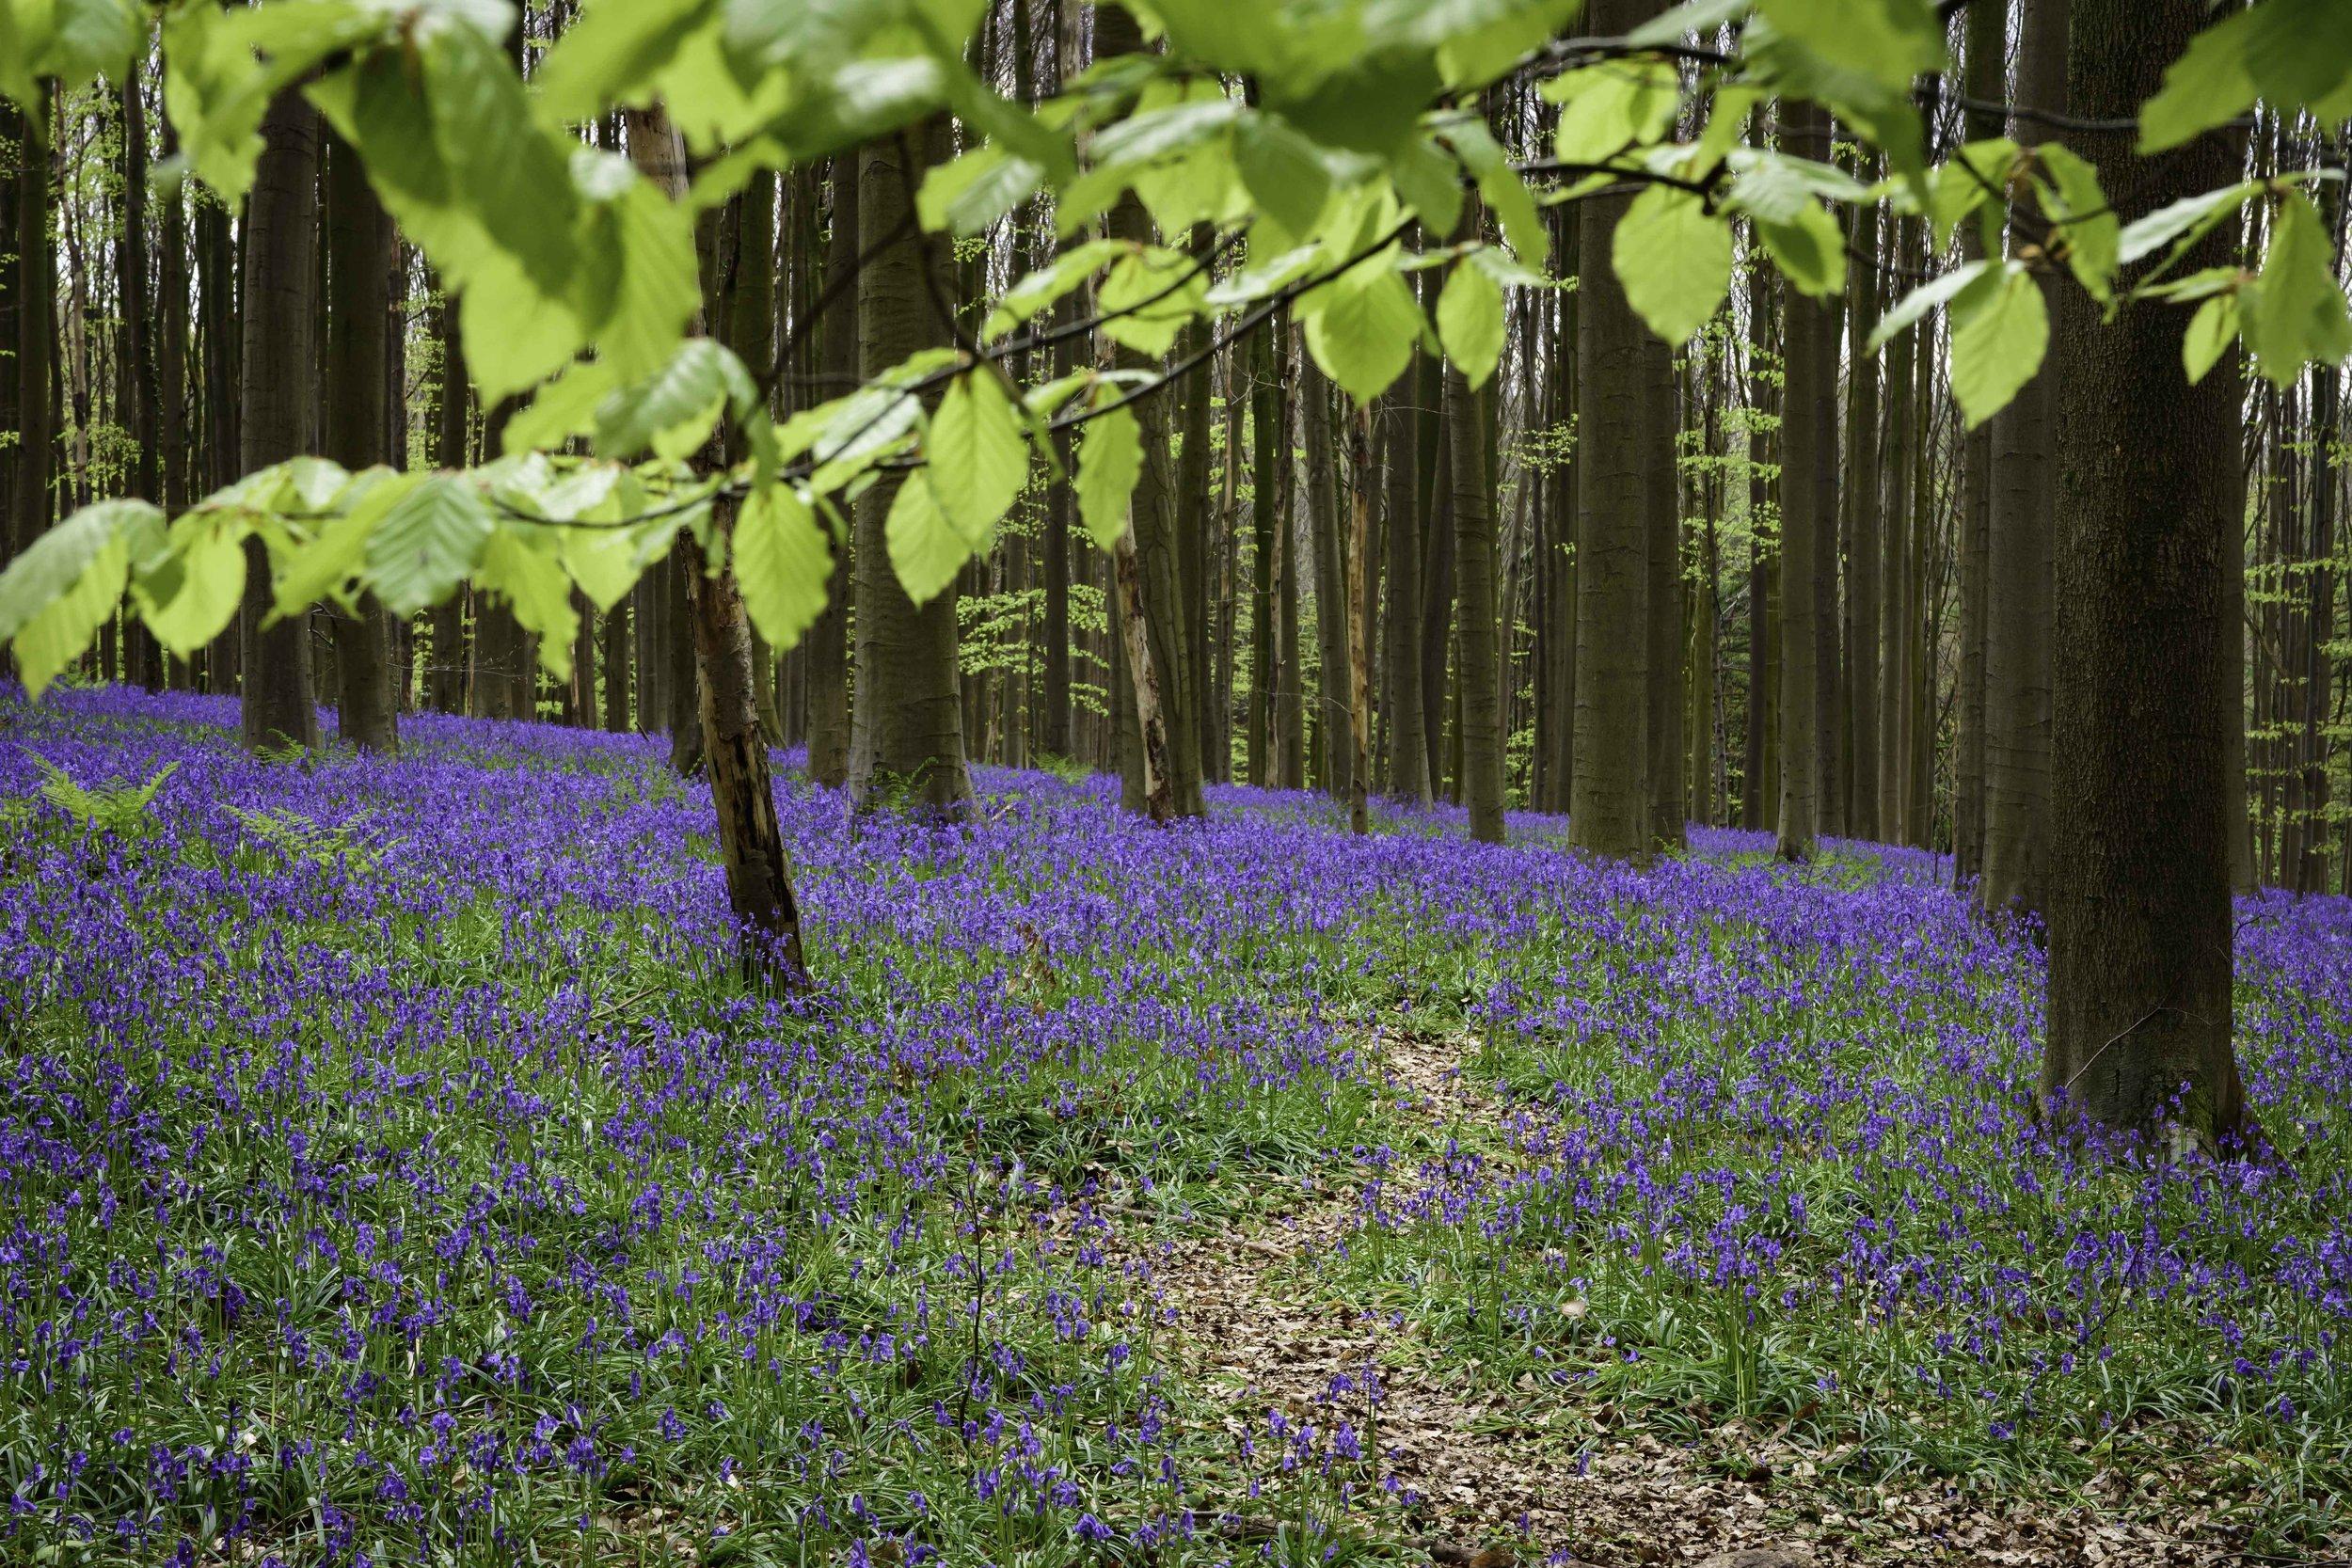 viewfinder-blauwe-hallerbos-fotograferen-tips-natuurfotografie-2